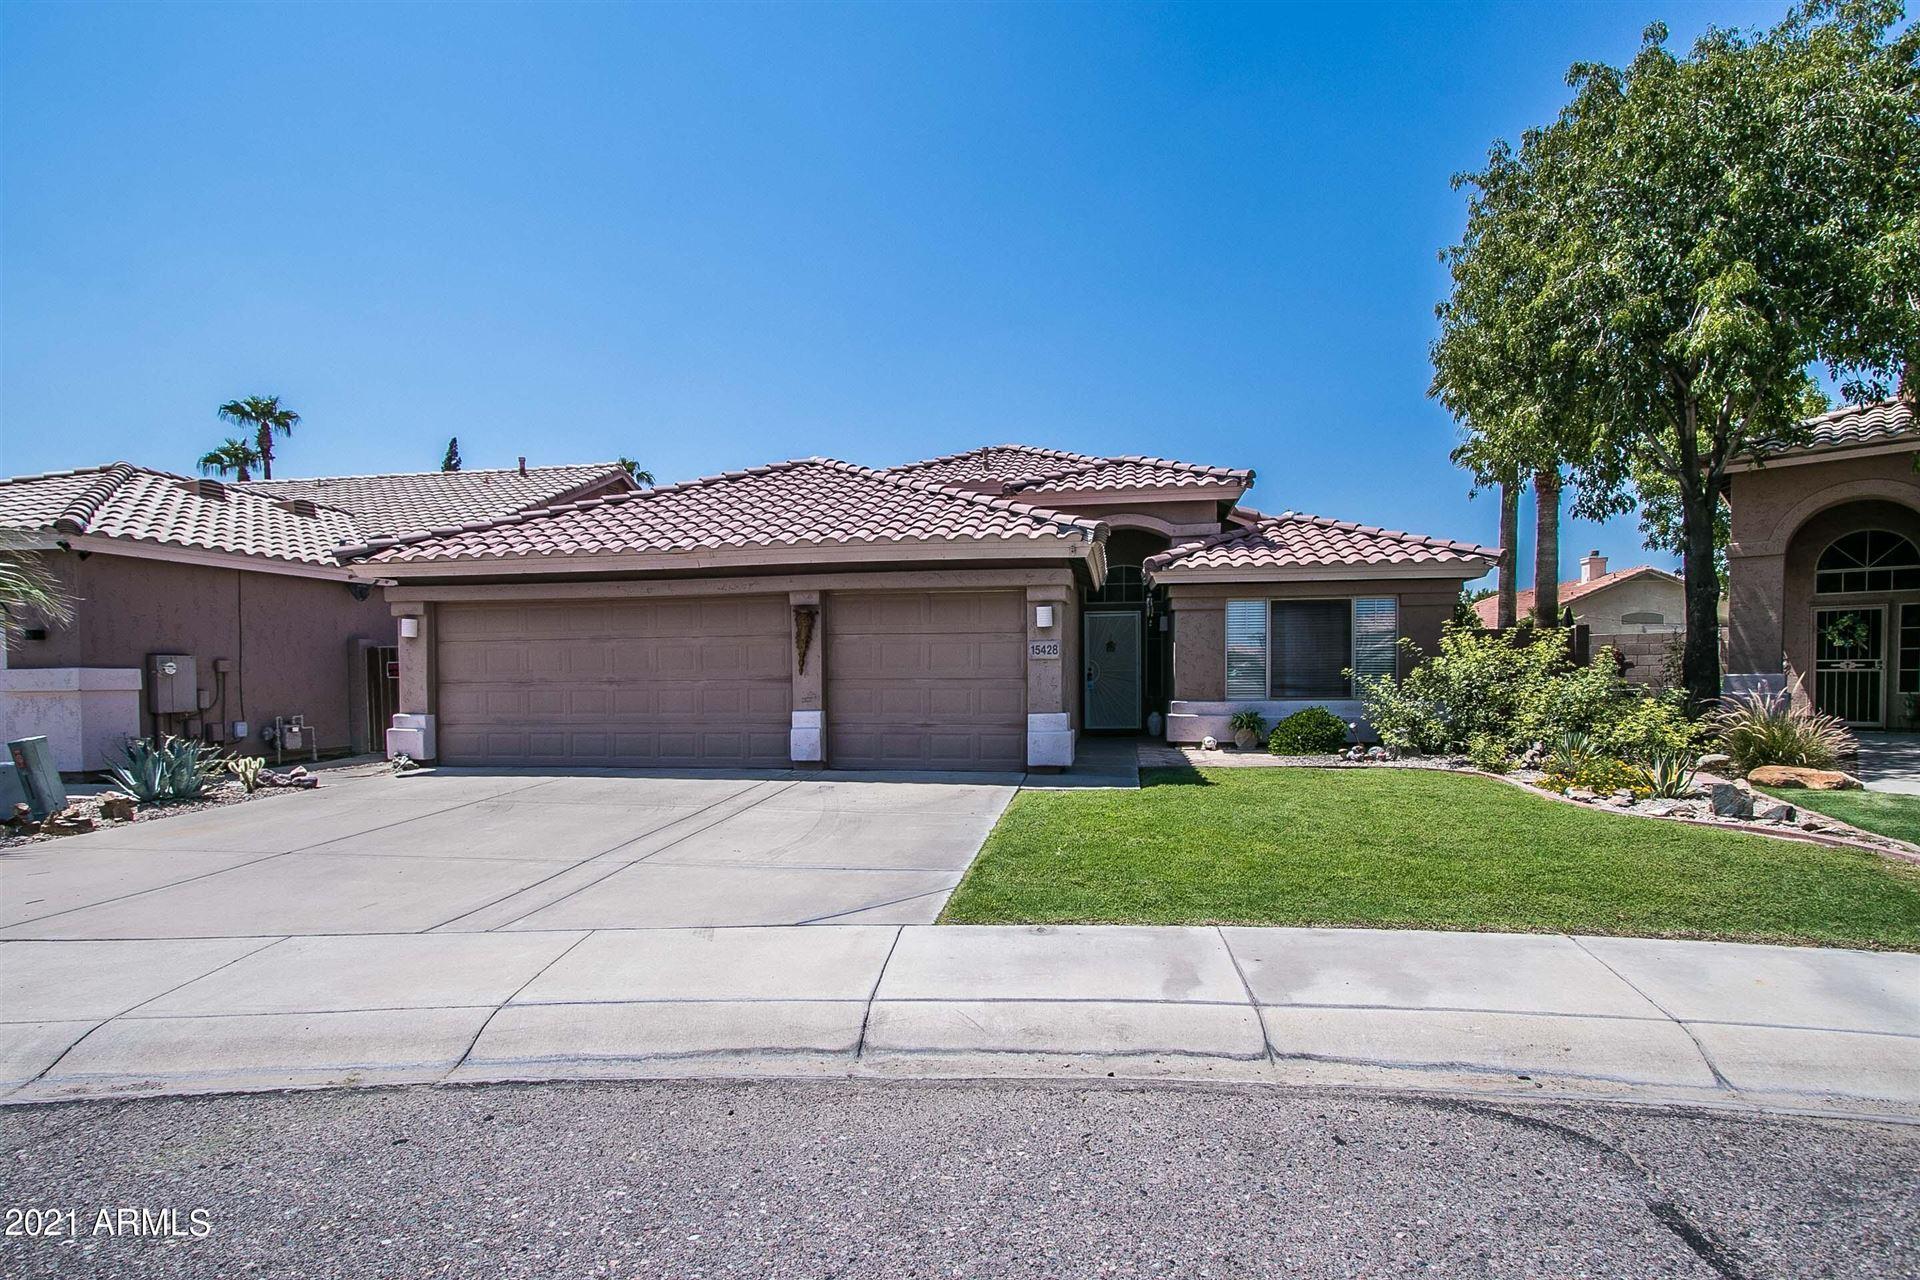 15428 S 46TH Place, Phoenix, AZ 85044 - MLS#: 6287455